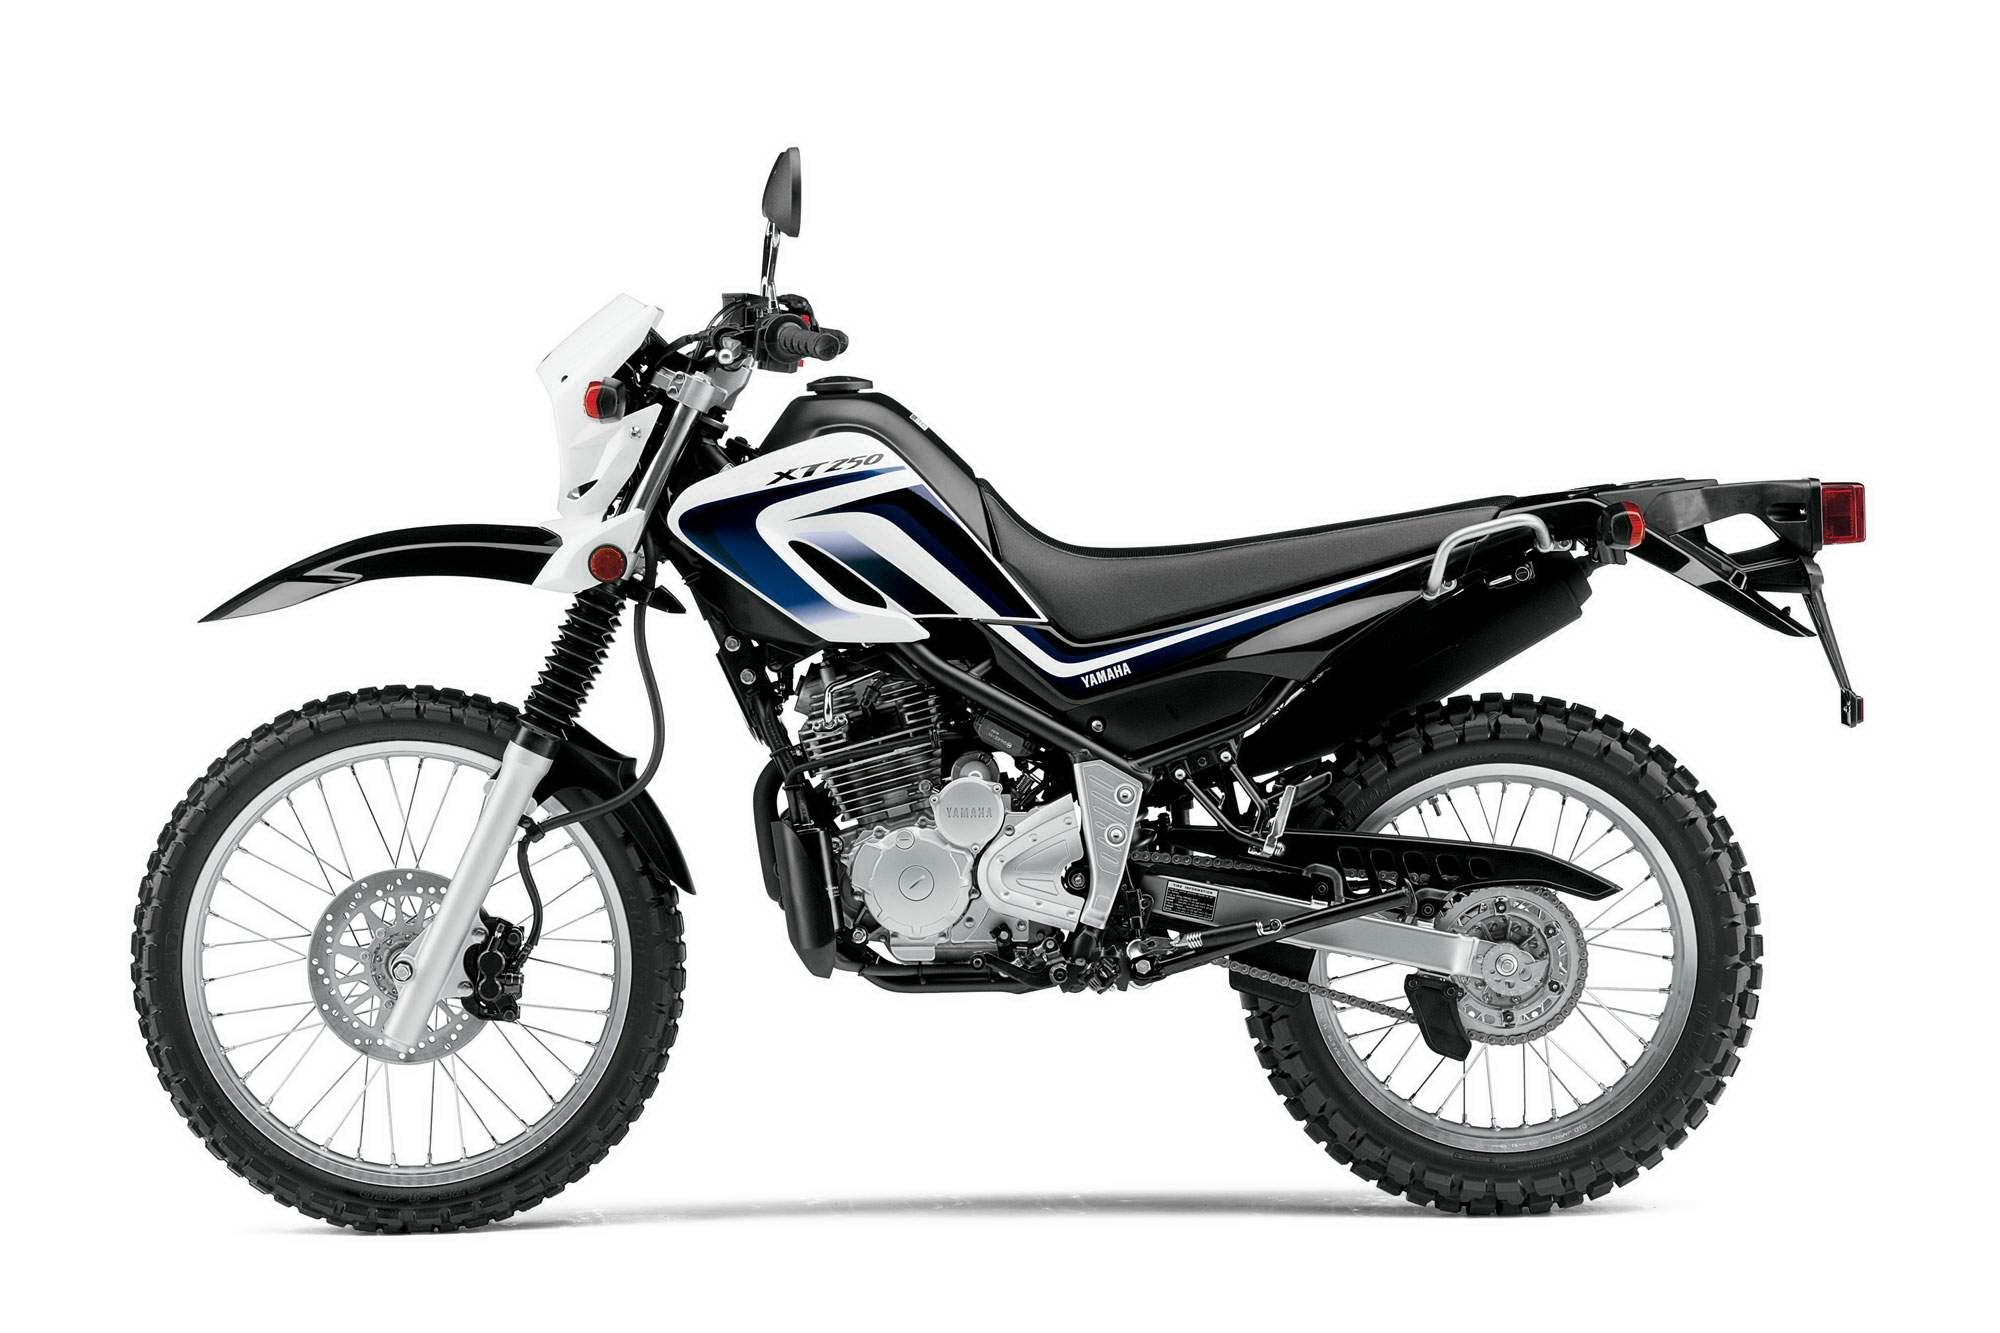 Yamaha Xt 250 Serow